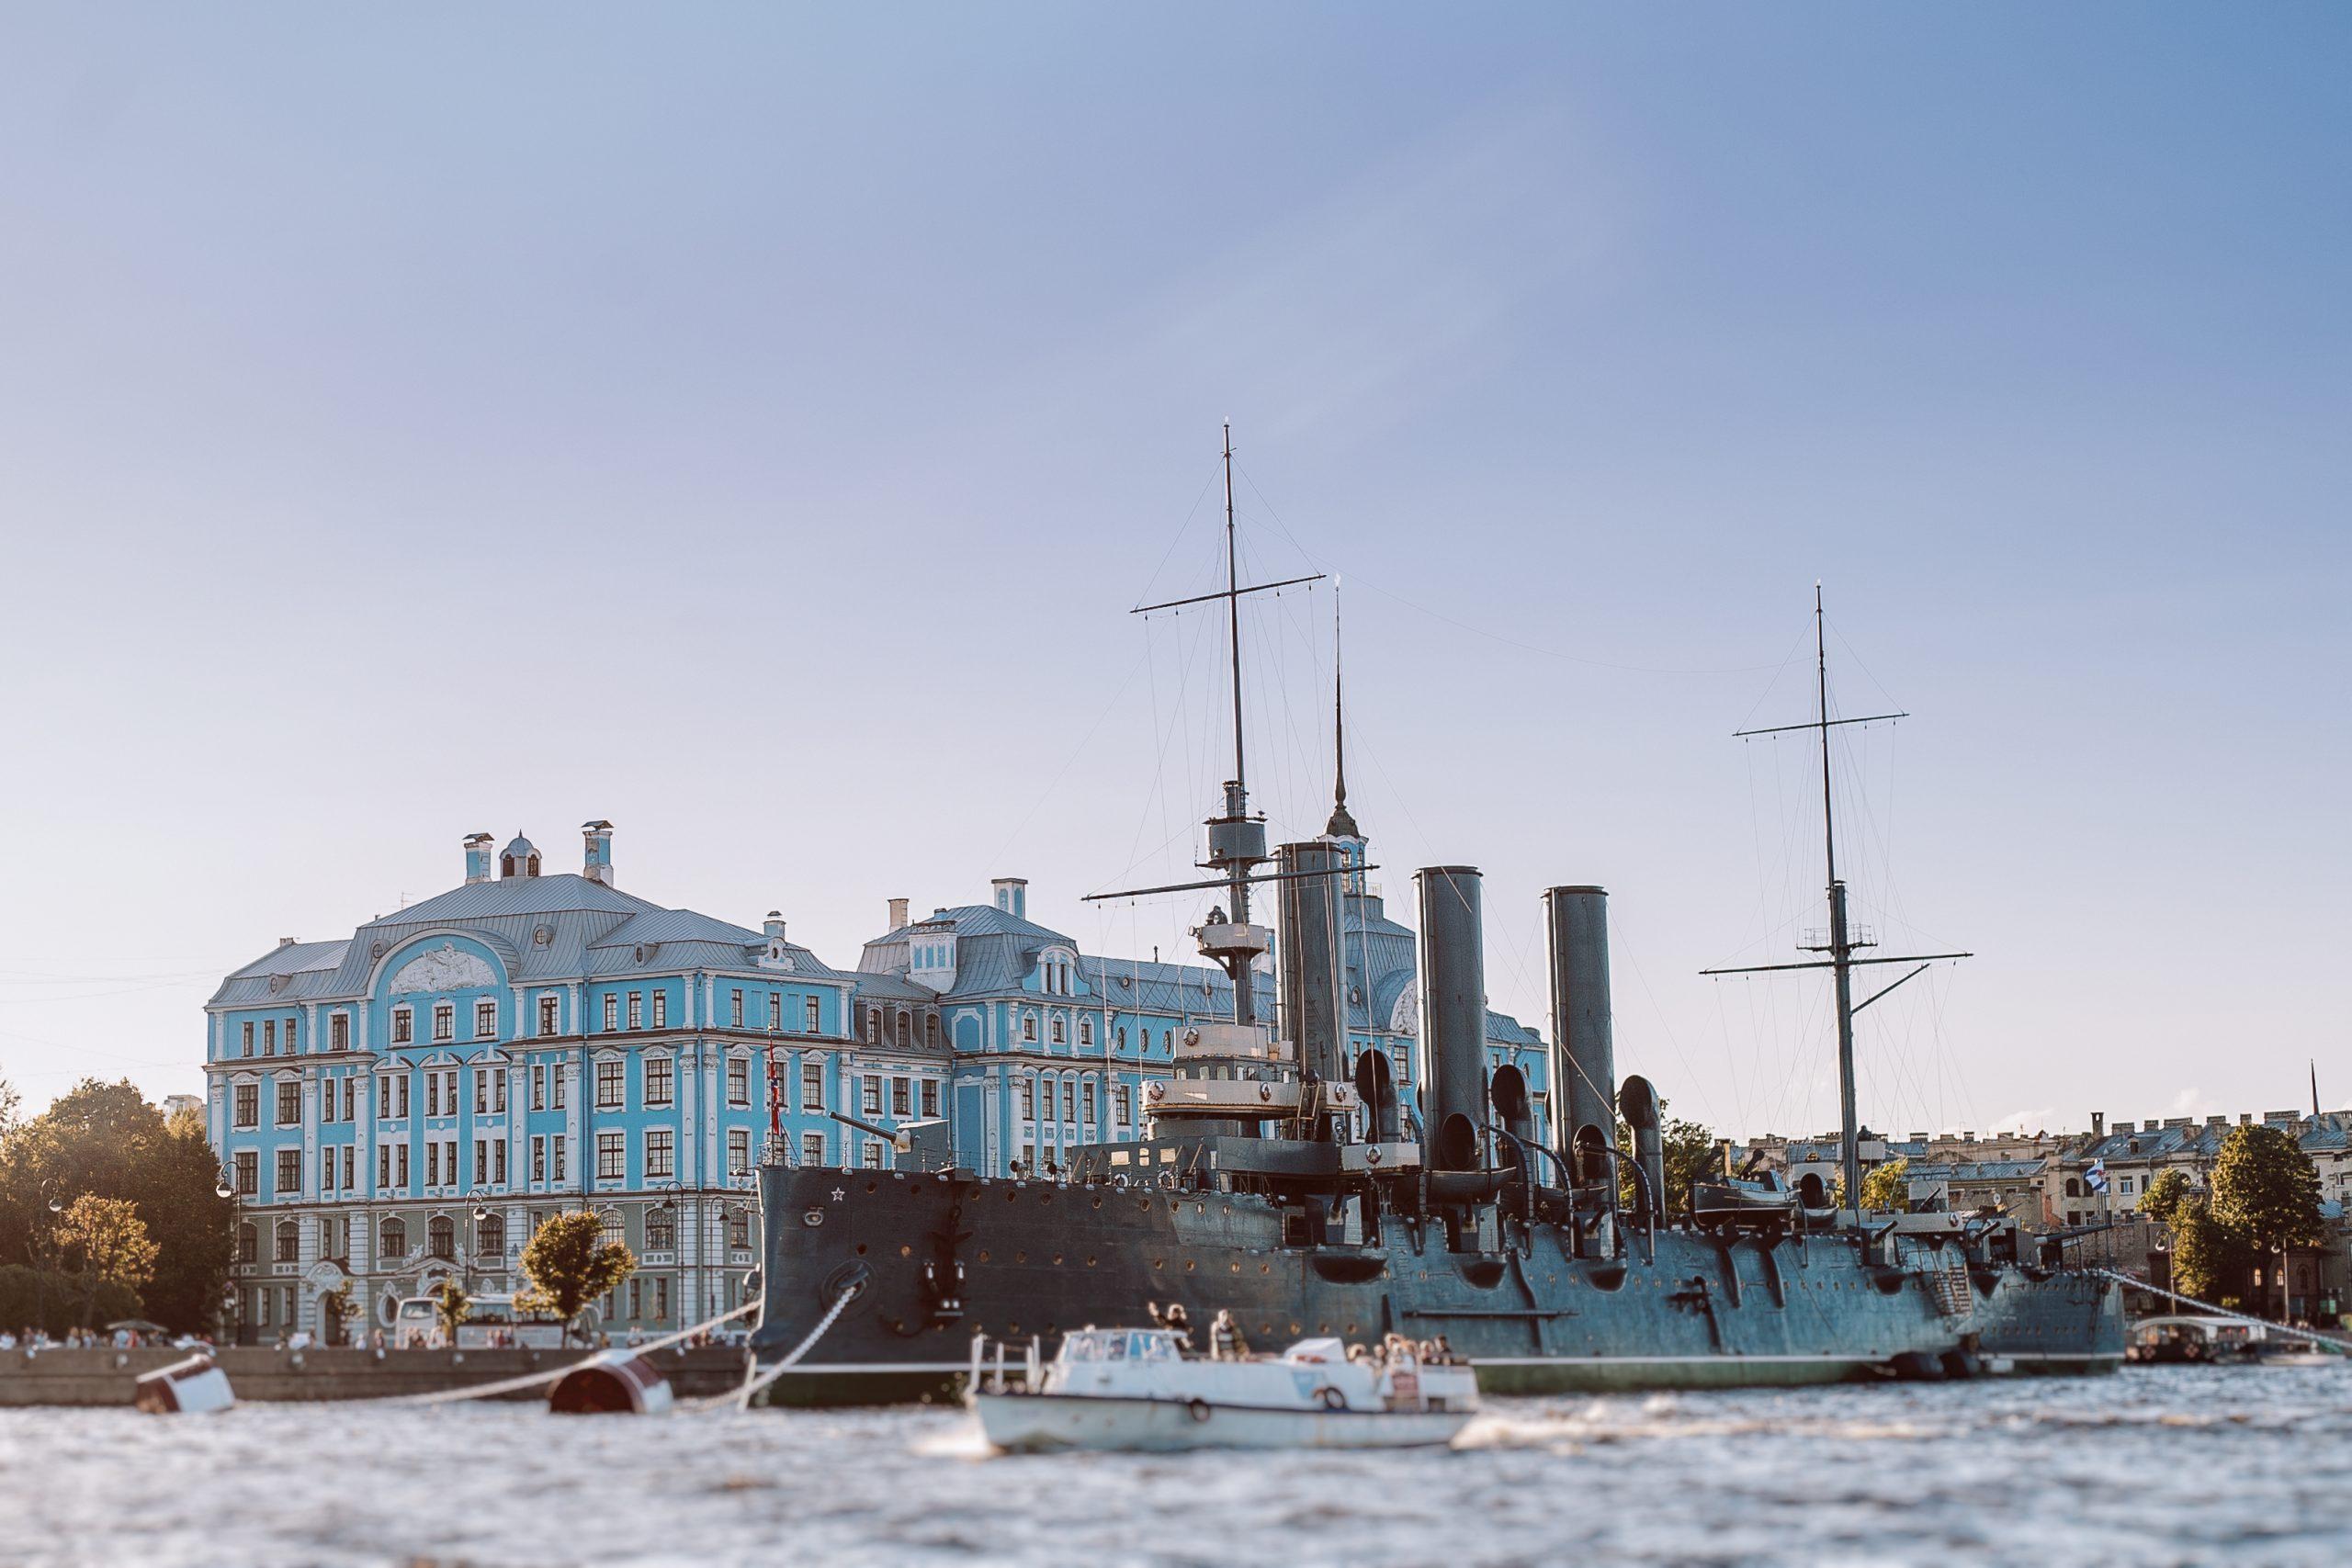 Saint Peterburg River Cruise and Ship